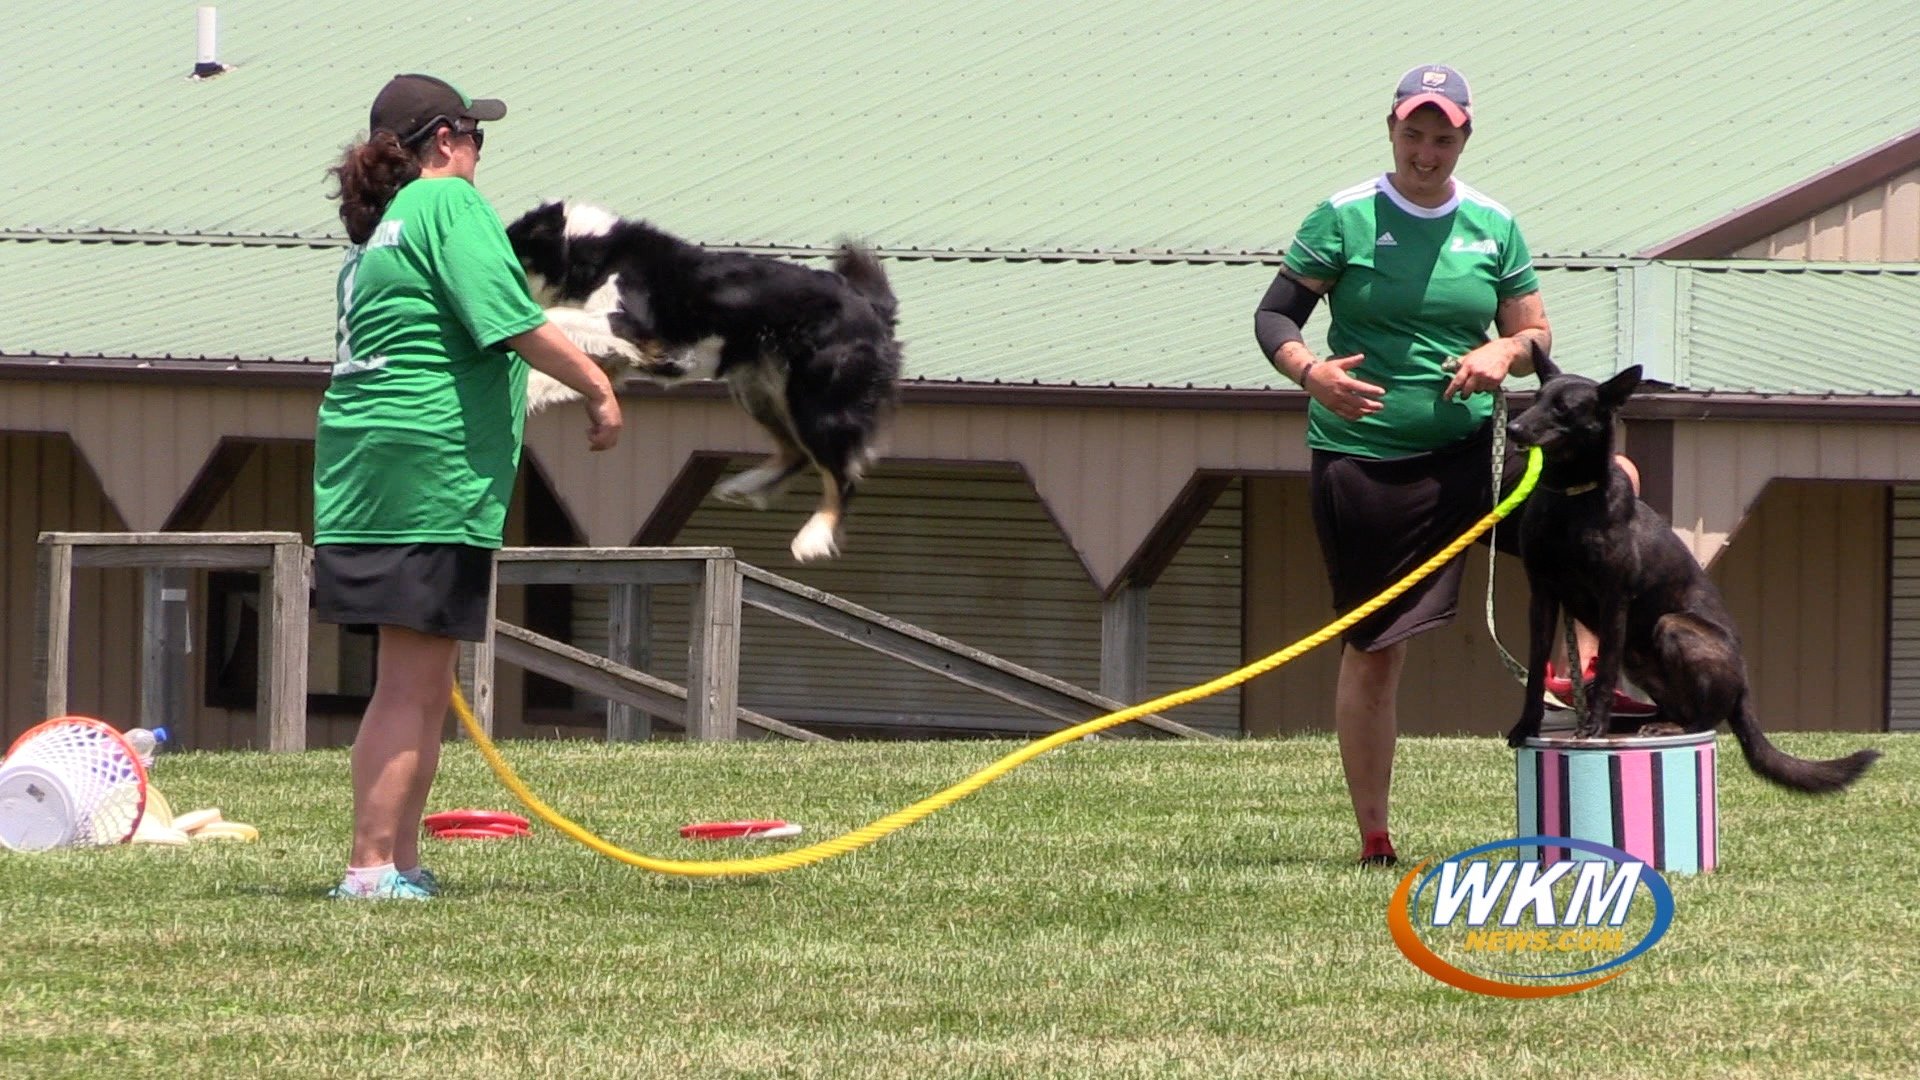 Extreme Dog Show Wows Trimble County